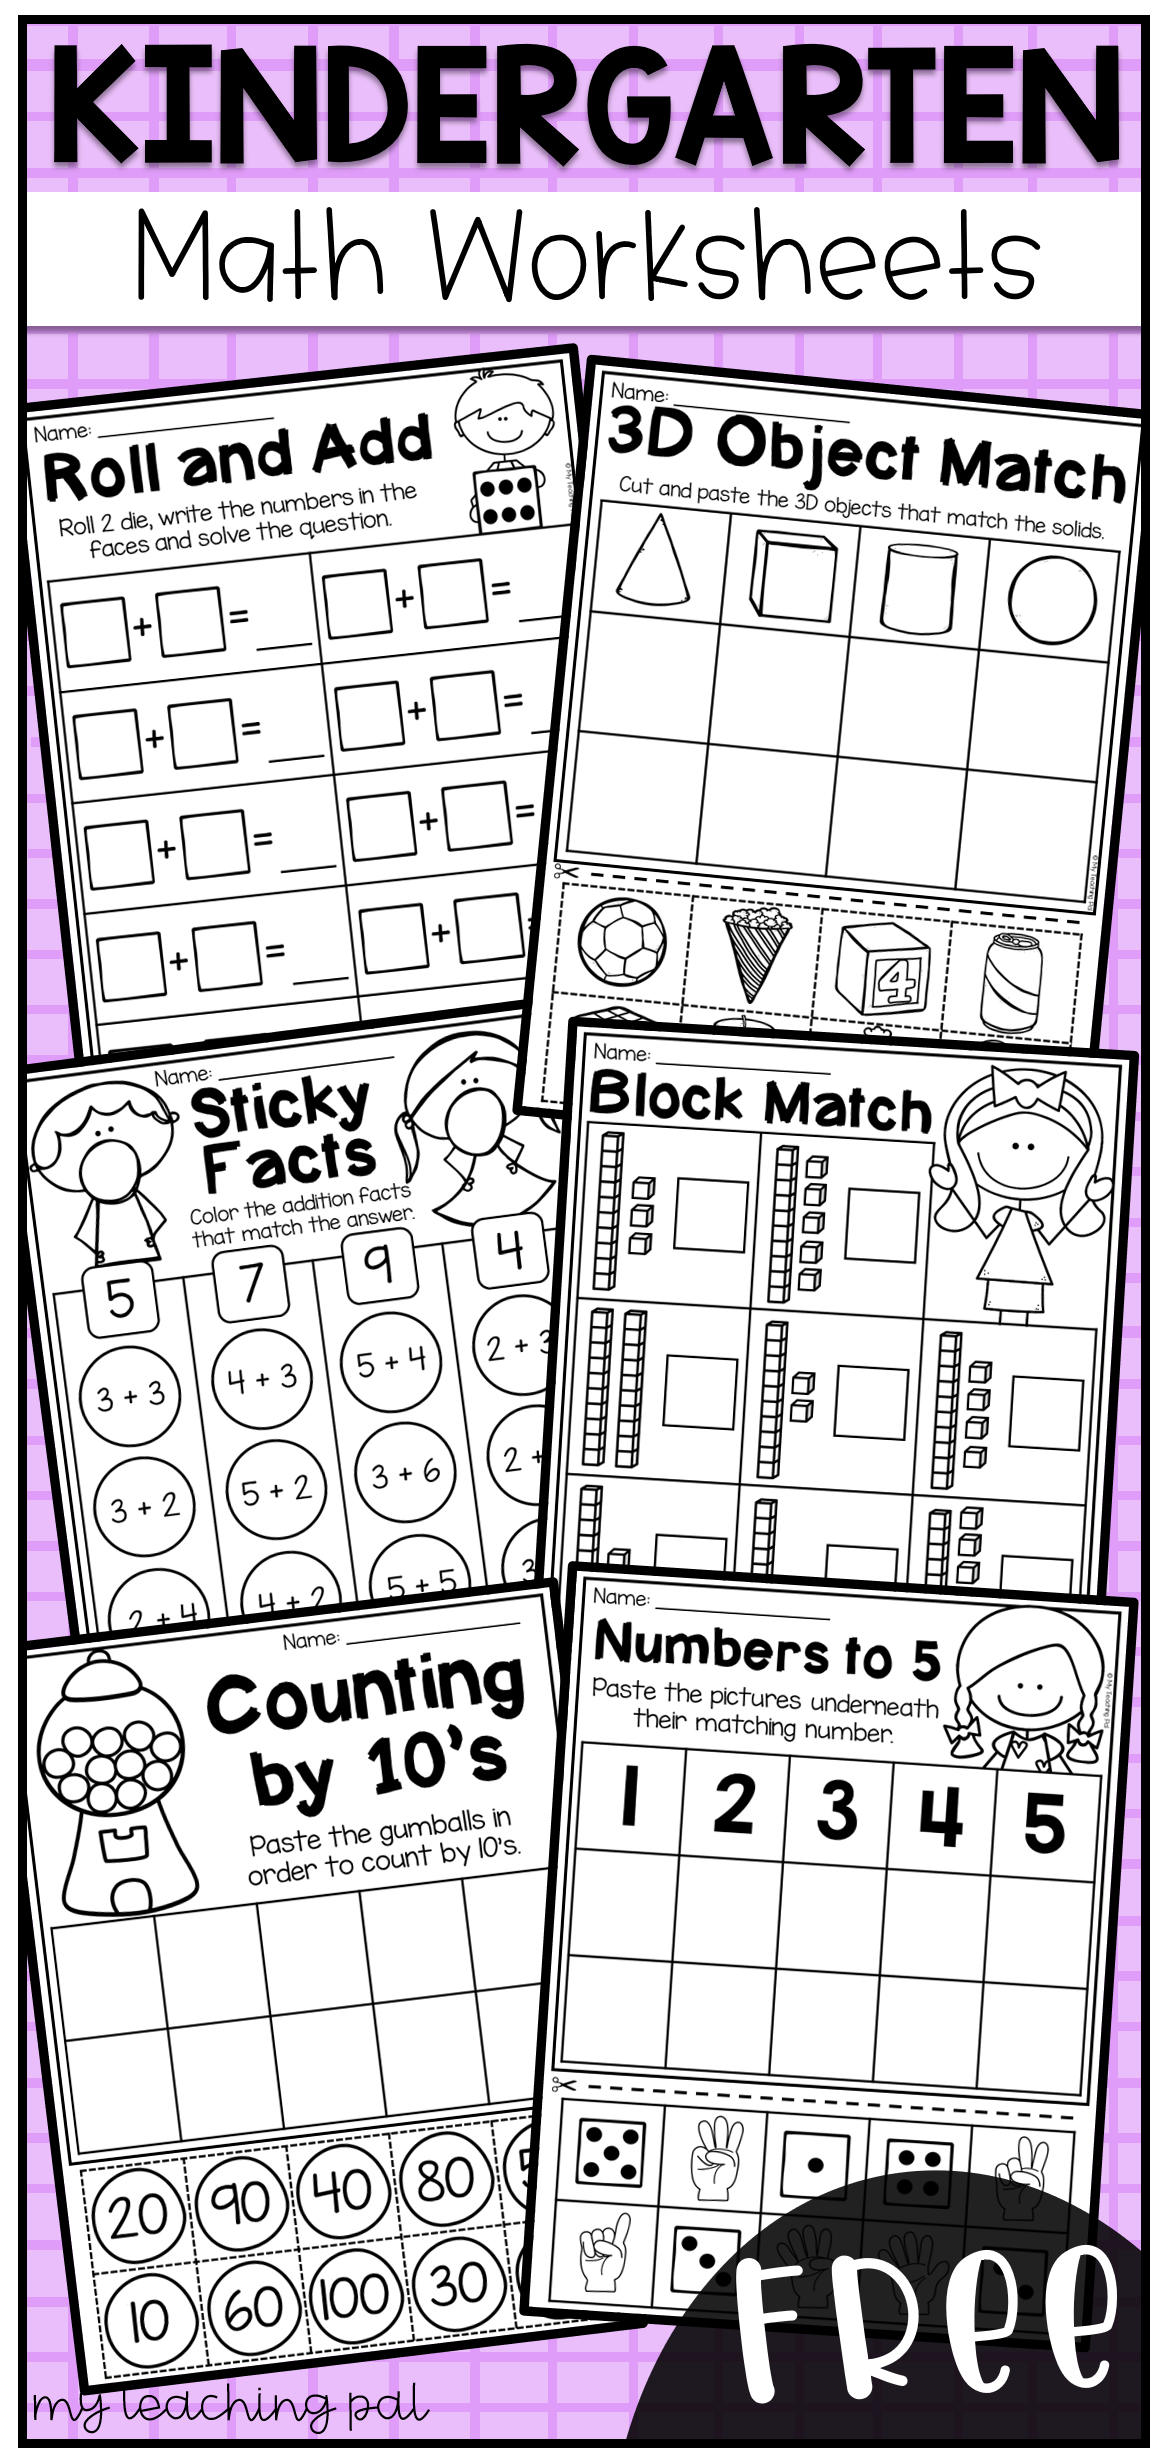 Free Kindergarten Math Worksheets 123 Centers Kindergarten Math Kindergarten Math Free Kindergarten Math Worksheets Kindergarten Math Worksheets Free [ 2459 x 1159 Pixel ]